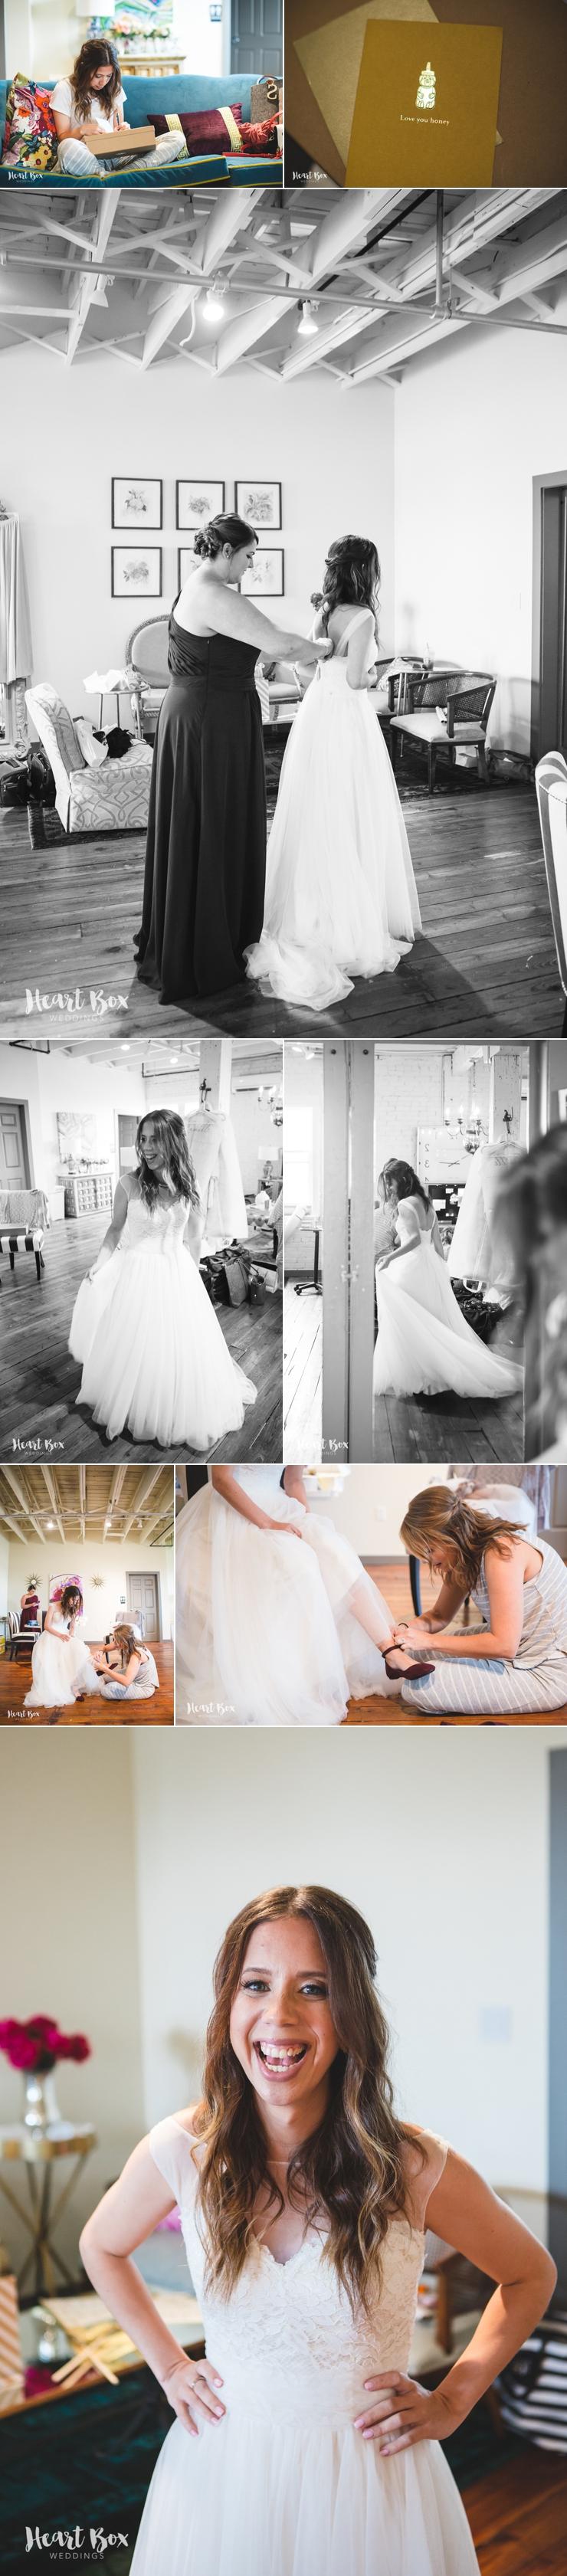 Hicks Wedding 7.jpg